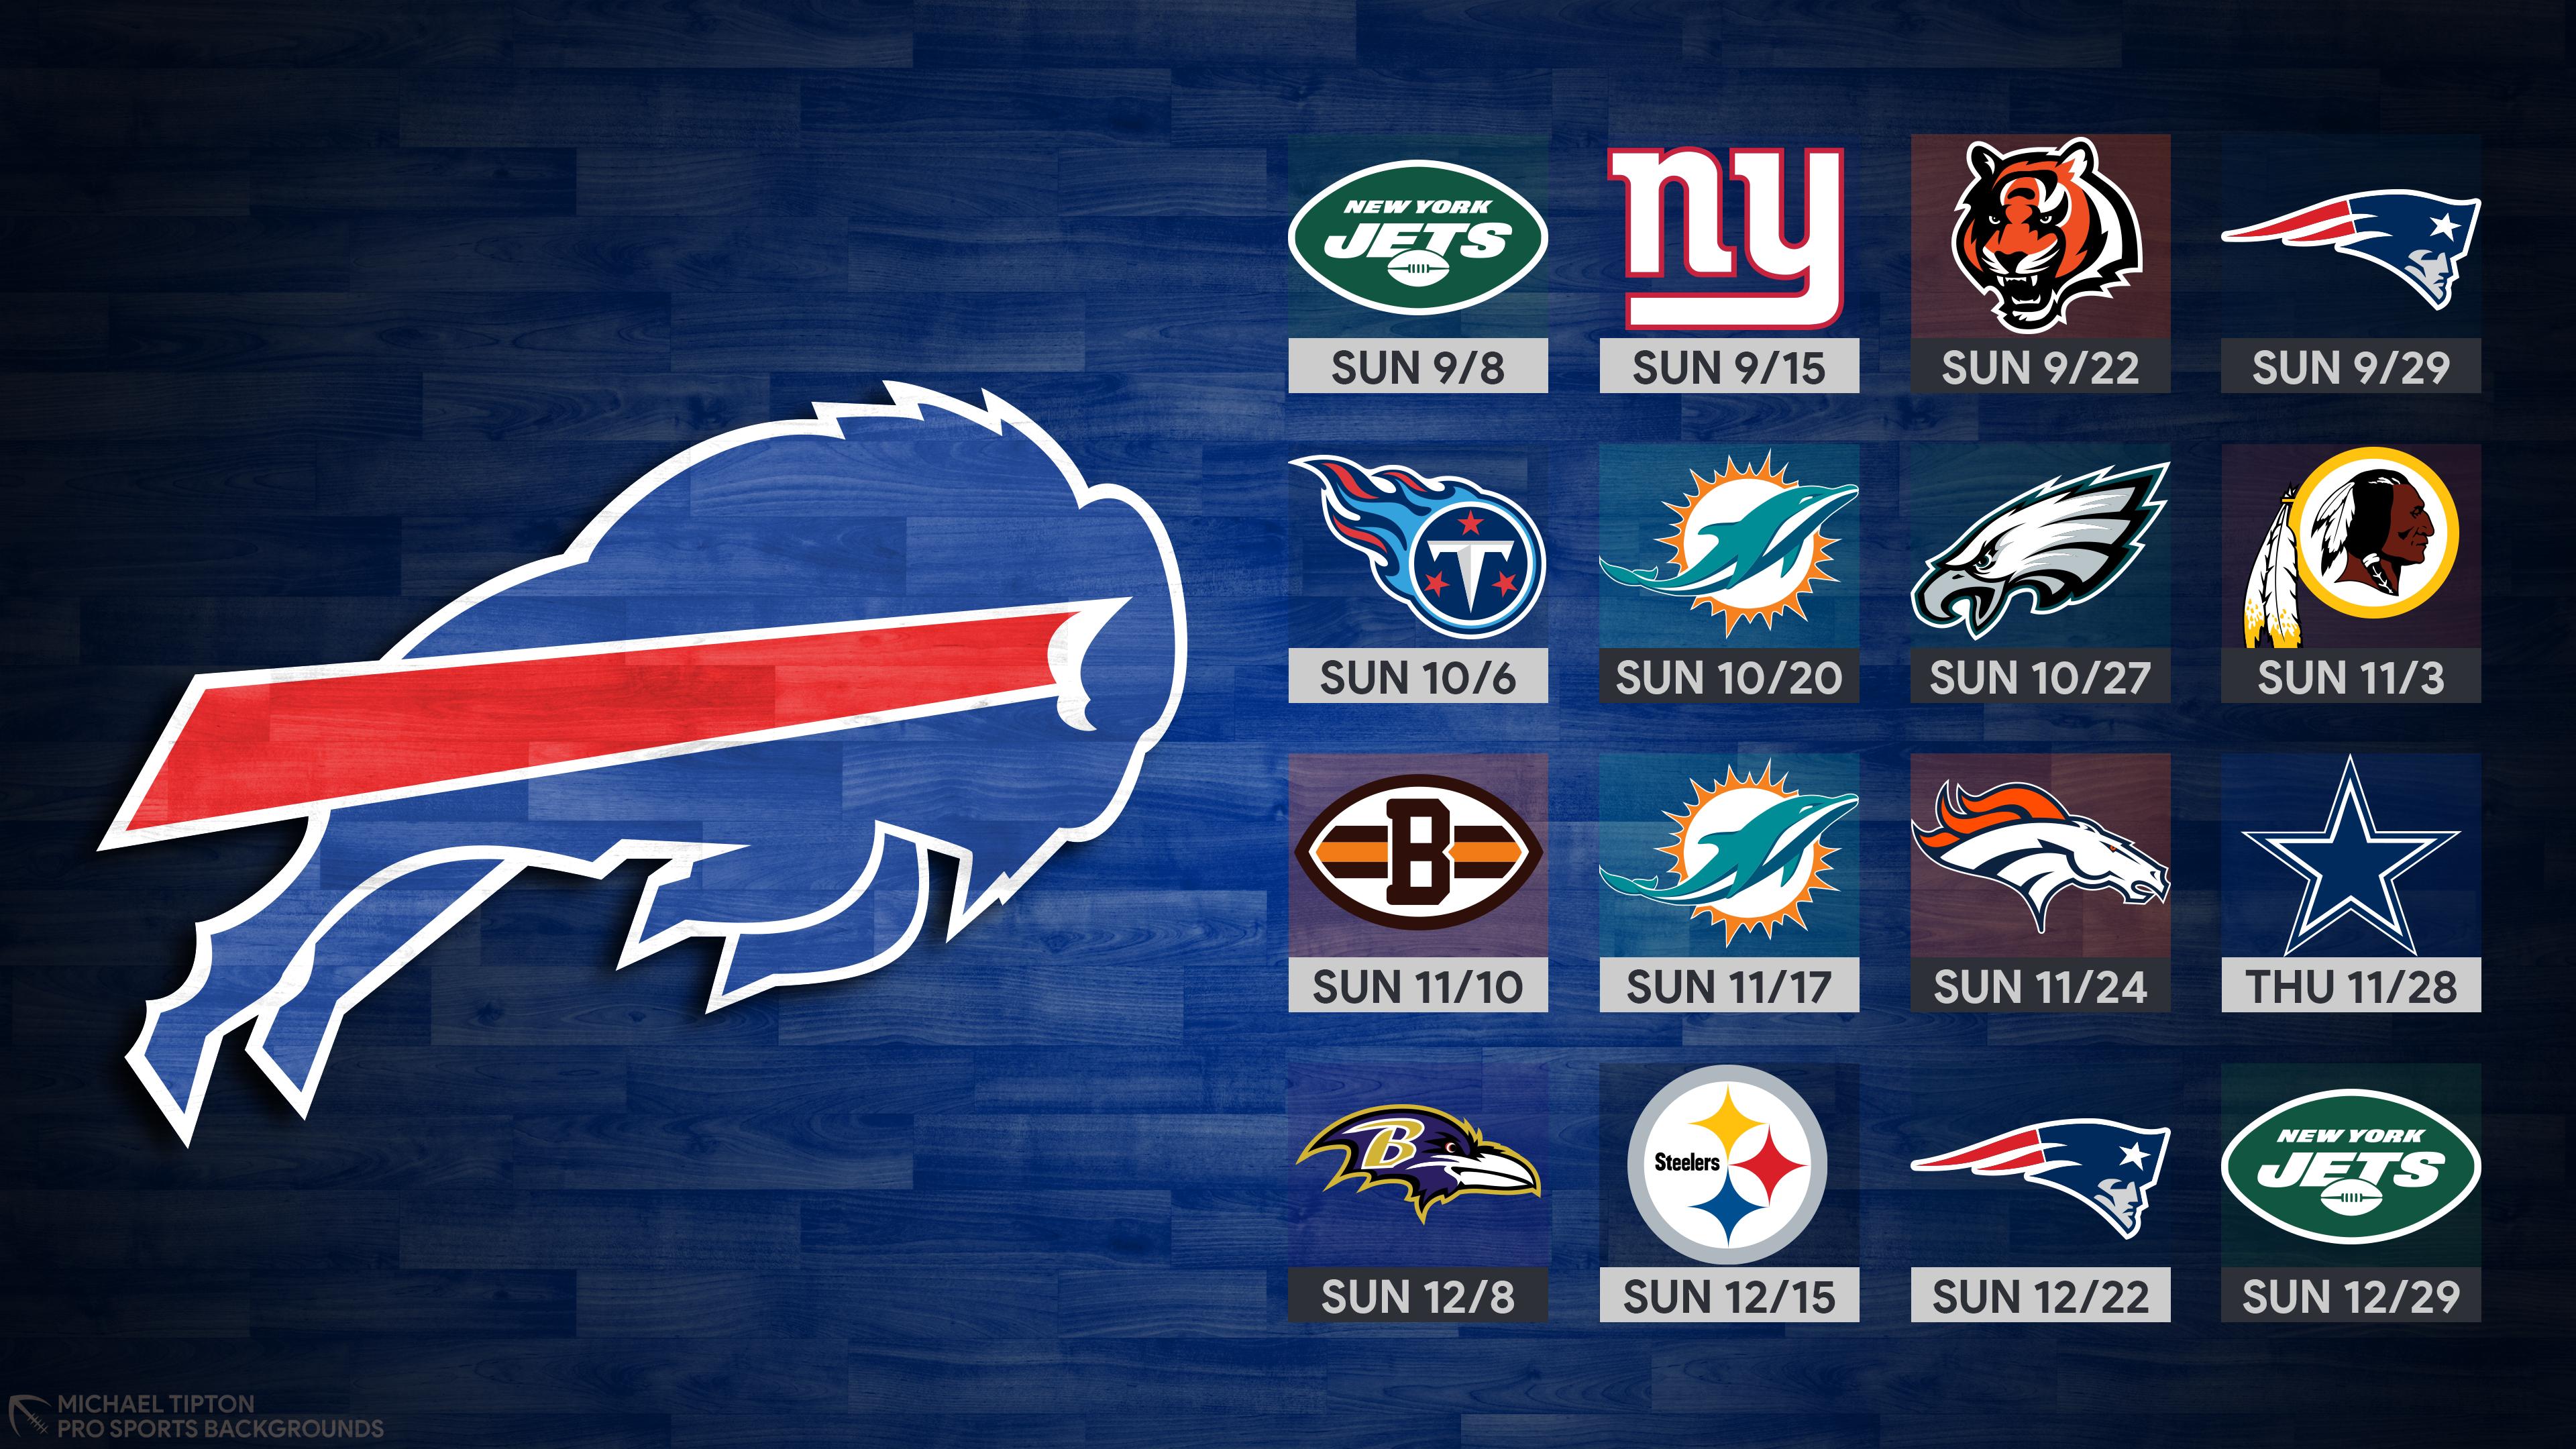 2019 Buffalo Bills Wallpapers Pro Sports Backgrounds 3840x2160